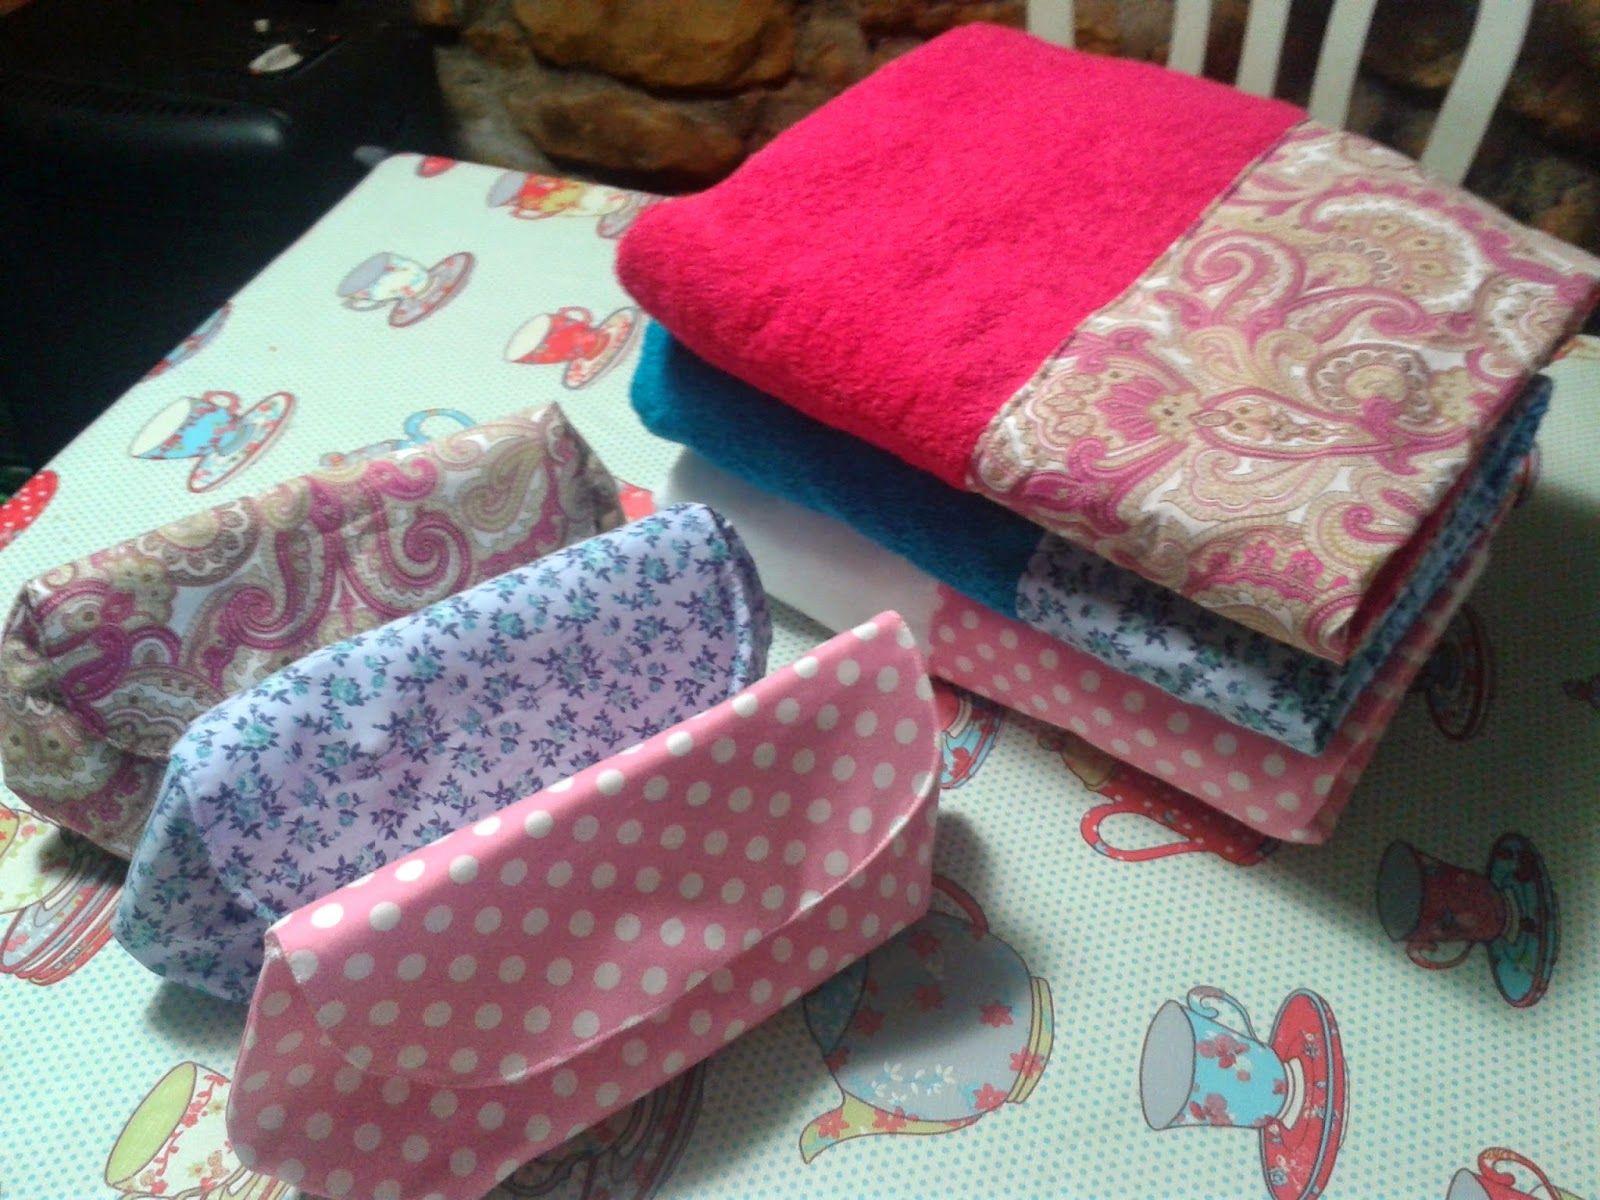 LereleLife: Conjunto toalla + neceser 25€. conjuntalo con un cesto de trapillo forrado o un capazo playero. www.lerelelife.com